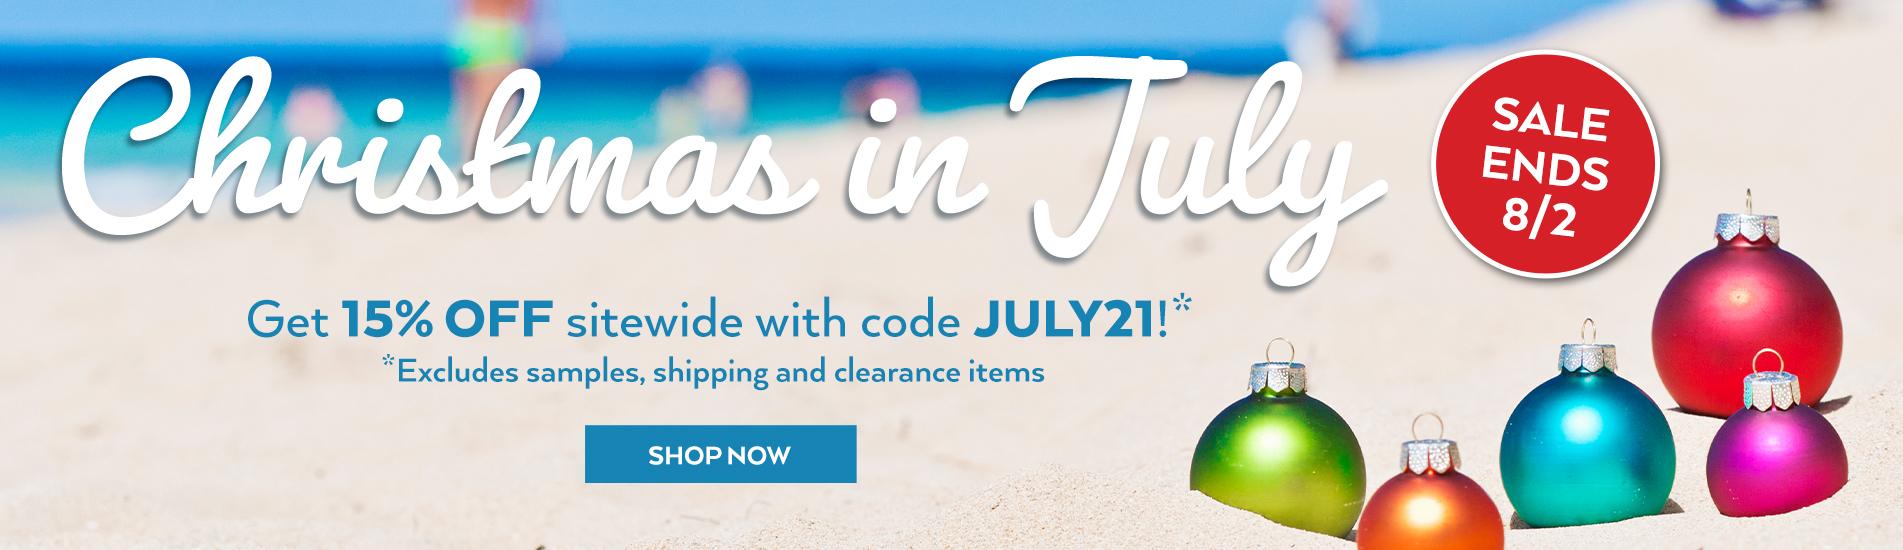 July Sale - Save 15%